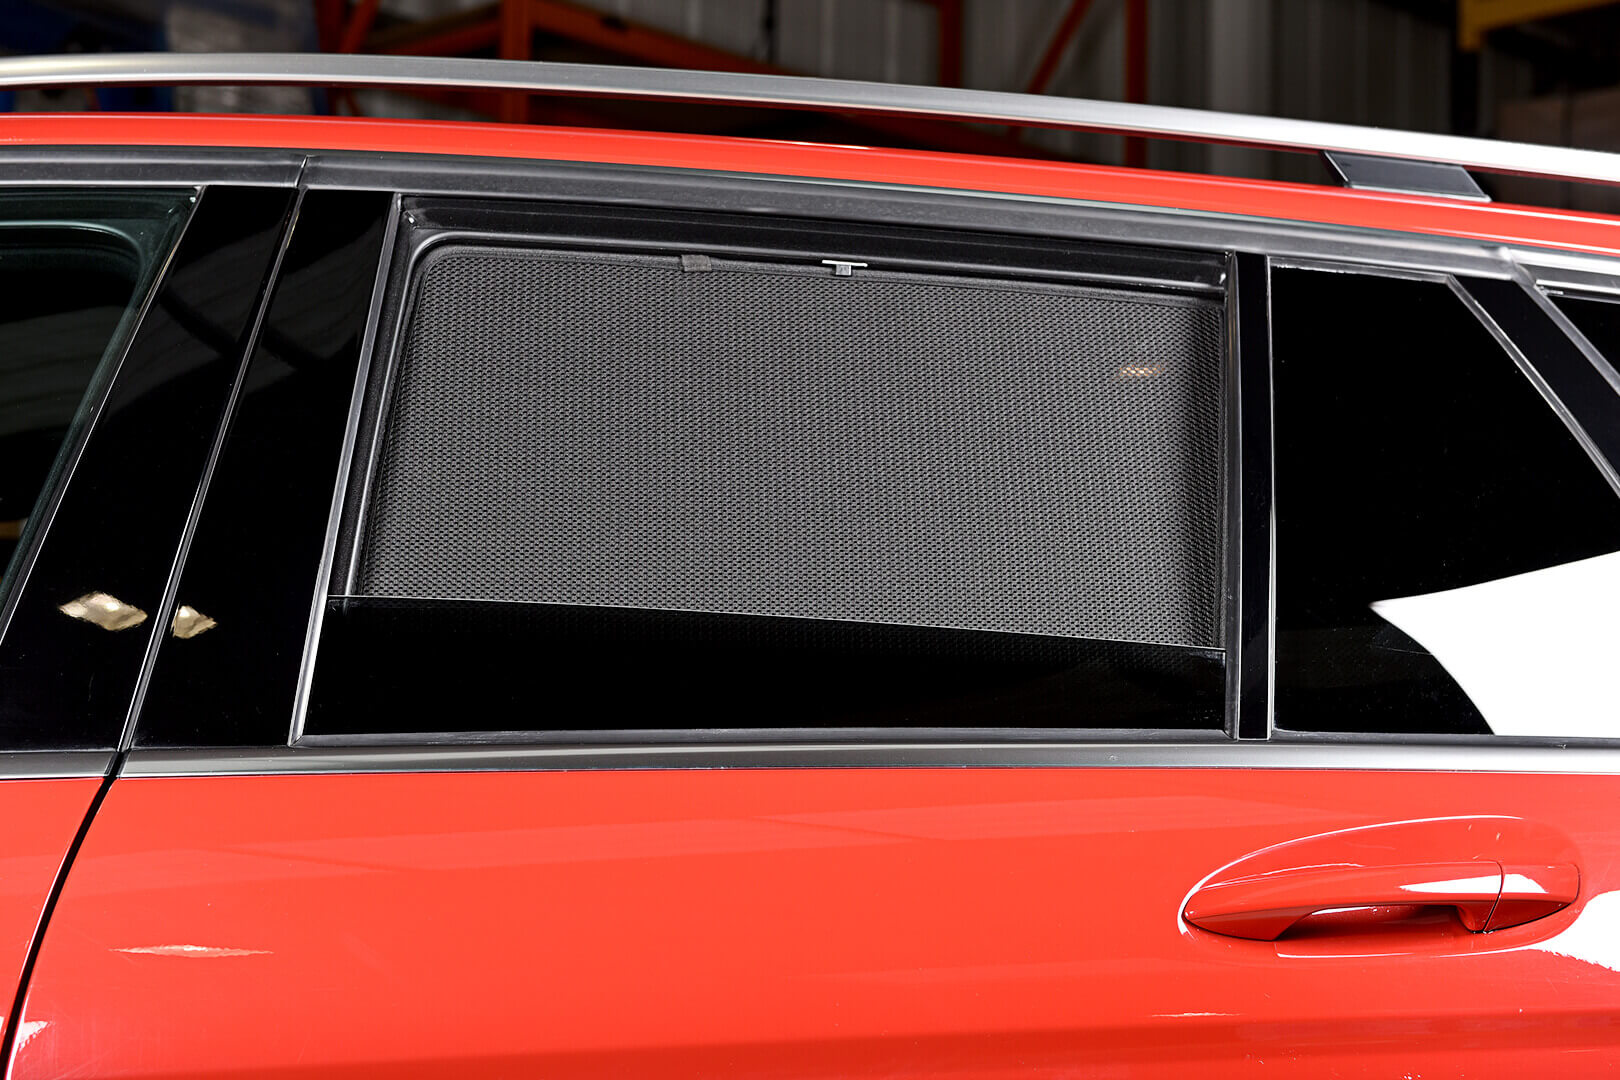 UV Car Shades (Set of 8) Mercedes C CLASS ESTATE 07-13 S204